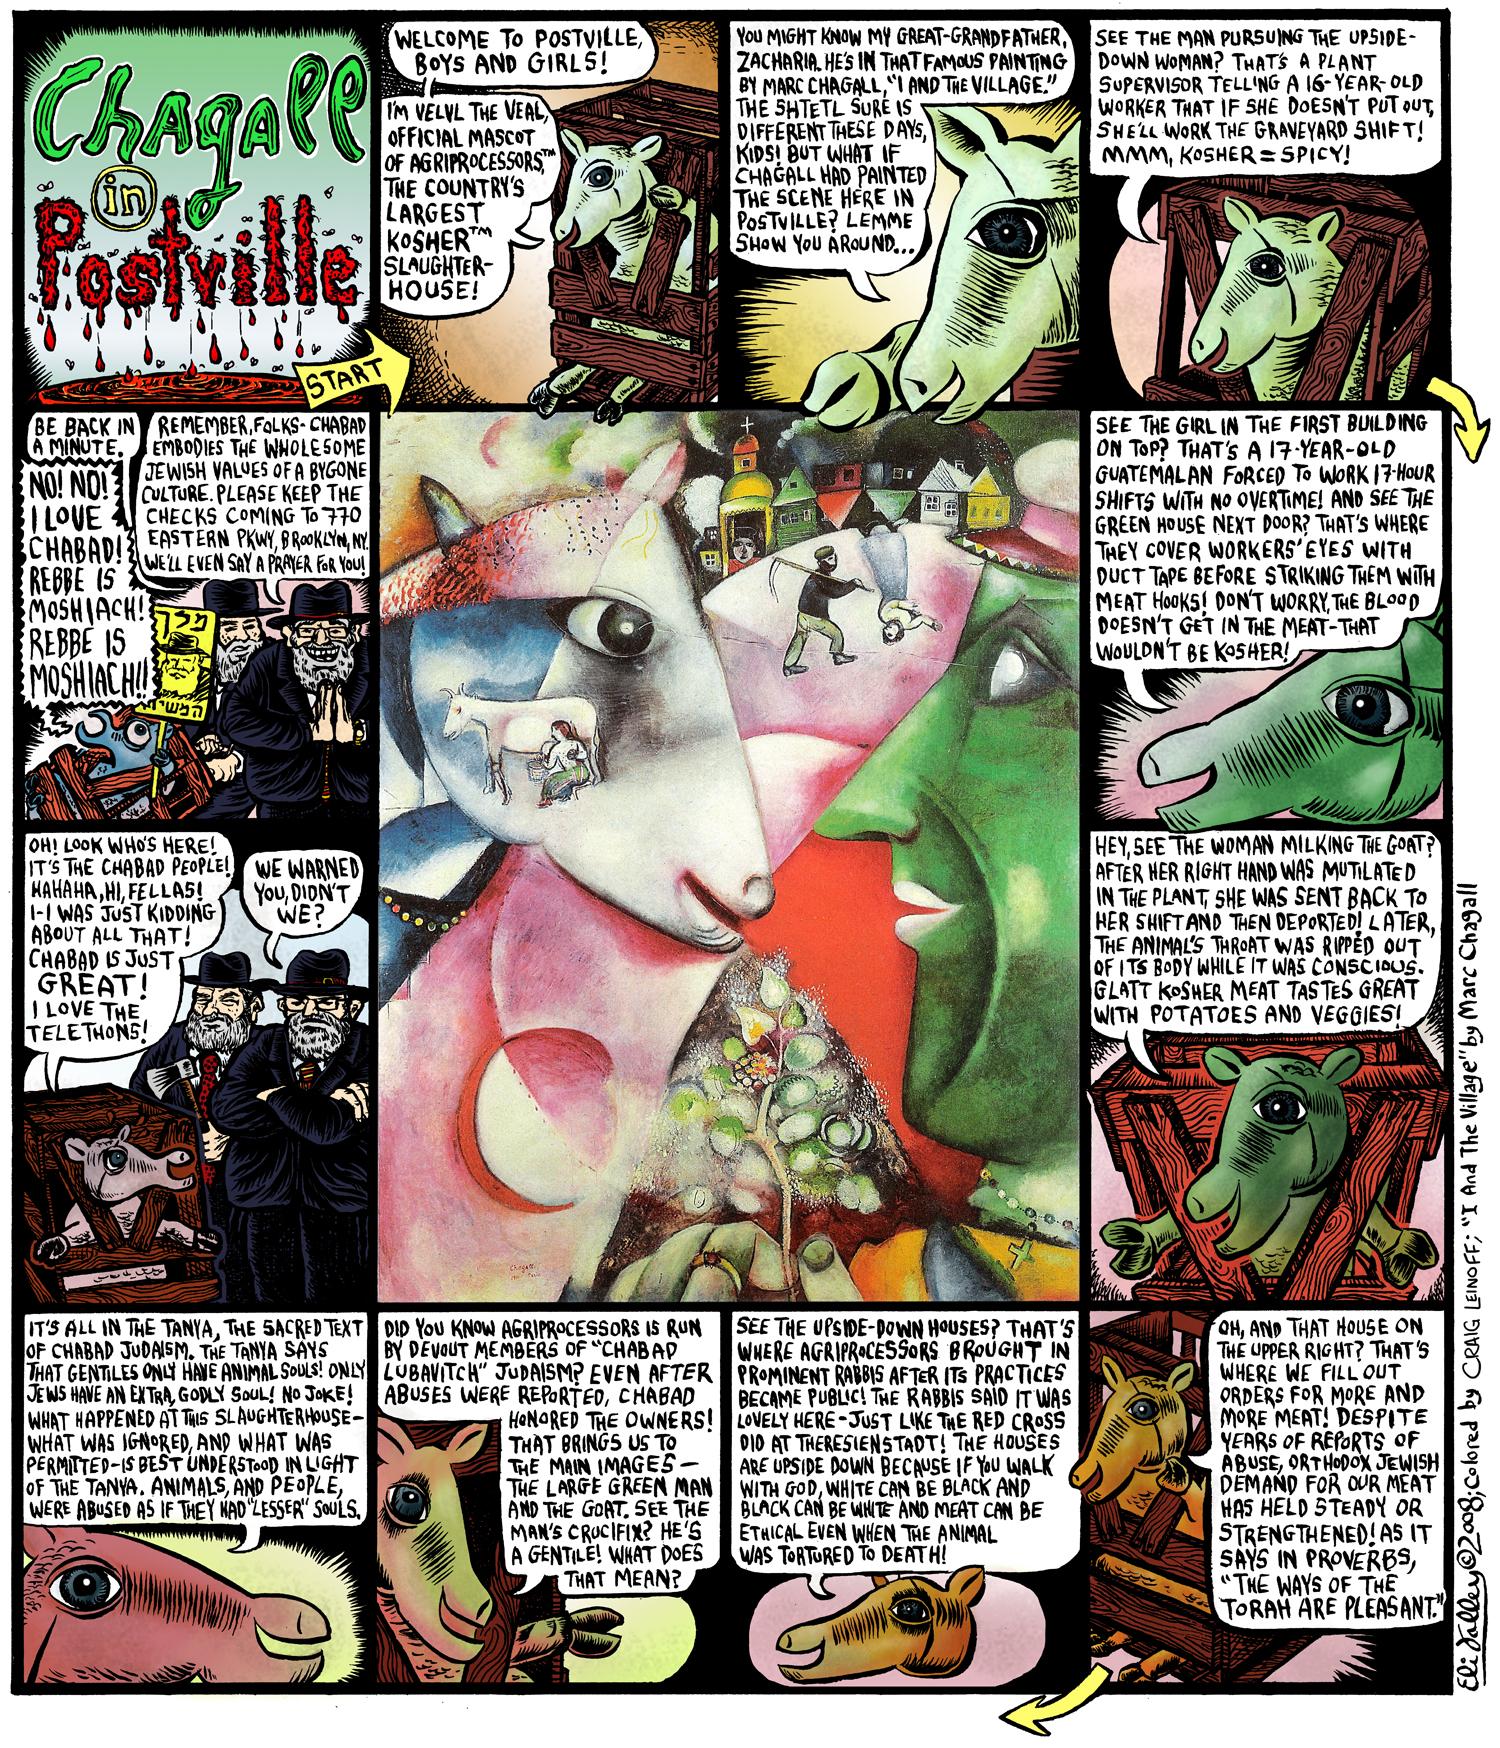 Chagall In Postville: Agriprocessors Slaughterhouse, Rubashkin. Jewcy, 12/8/08